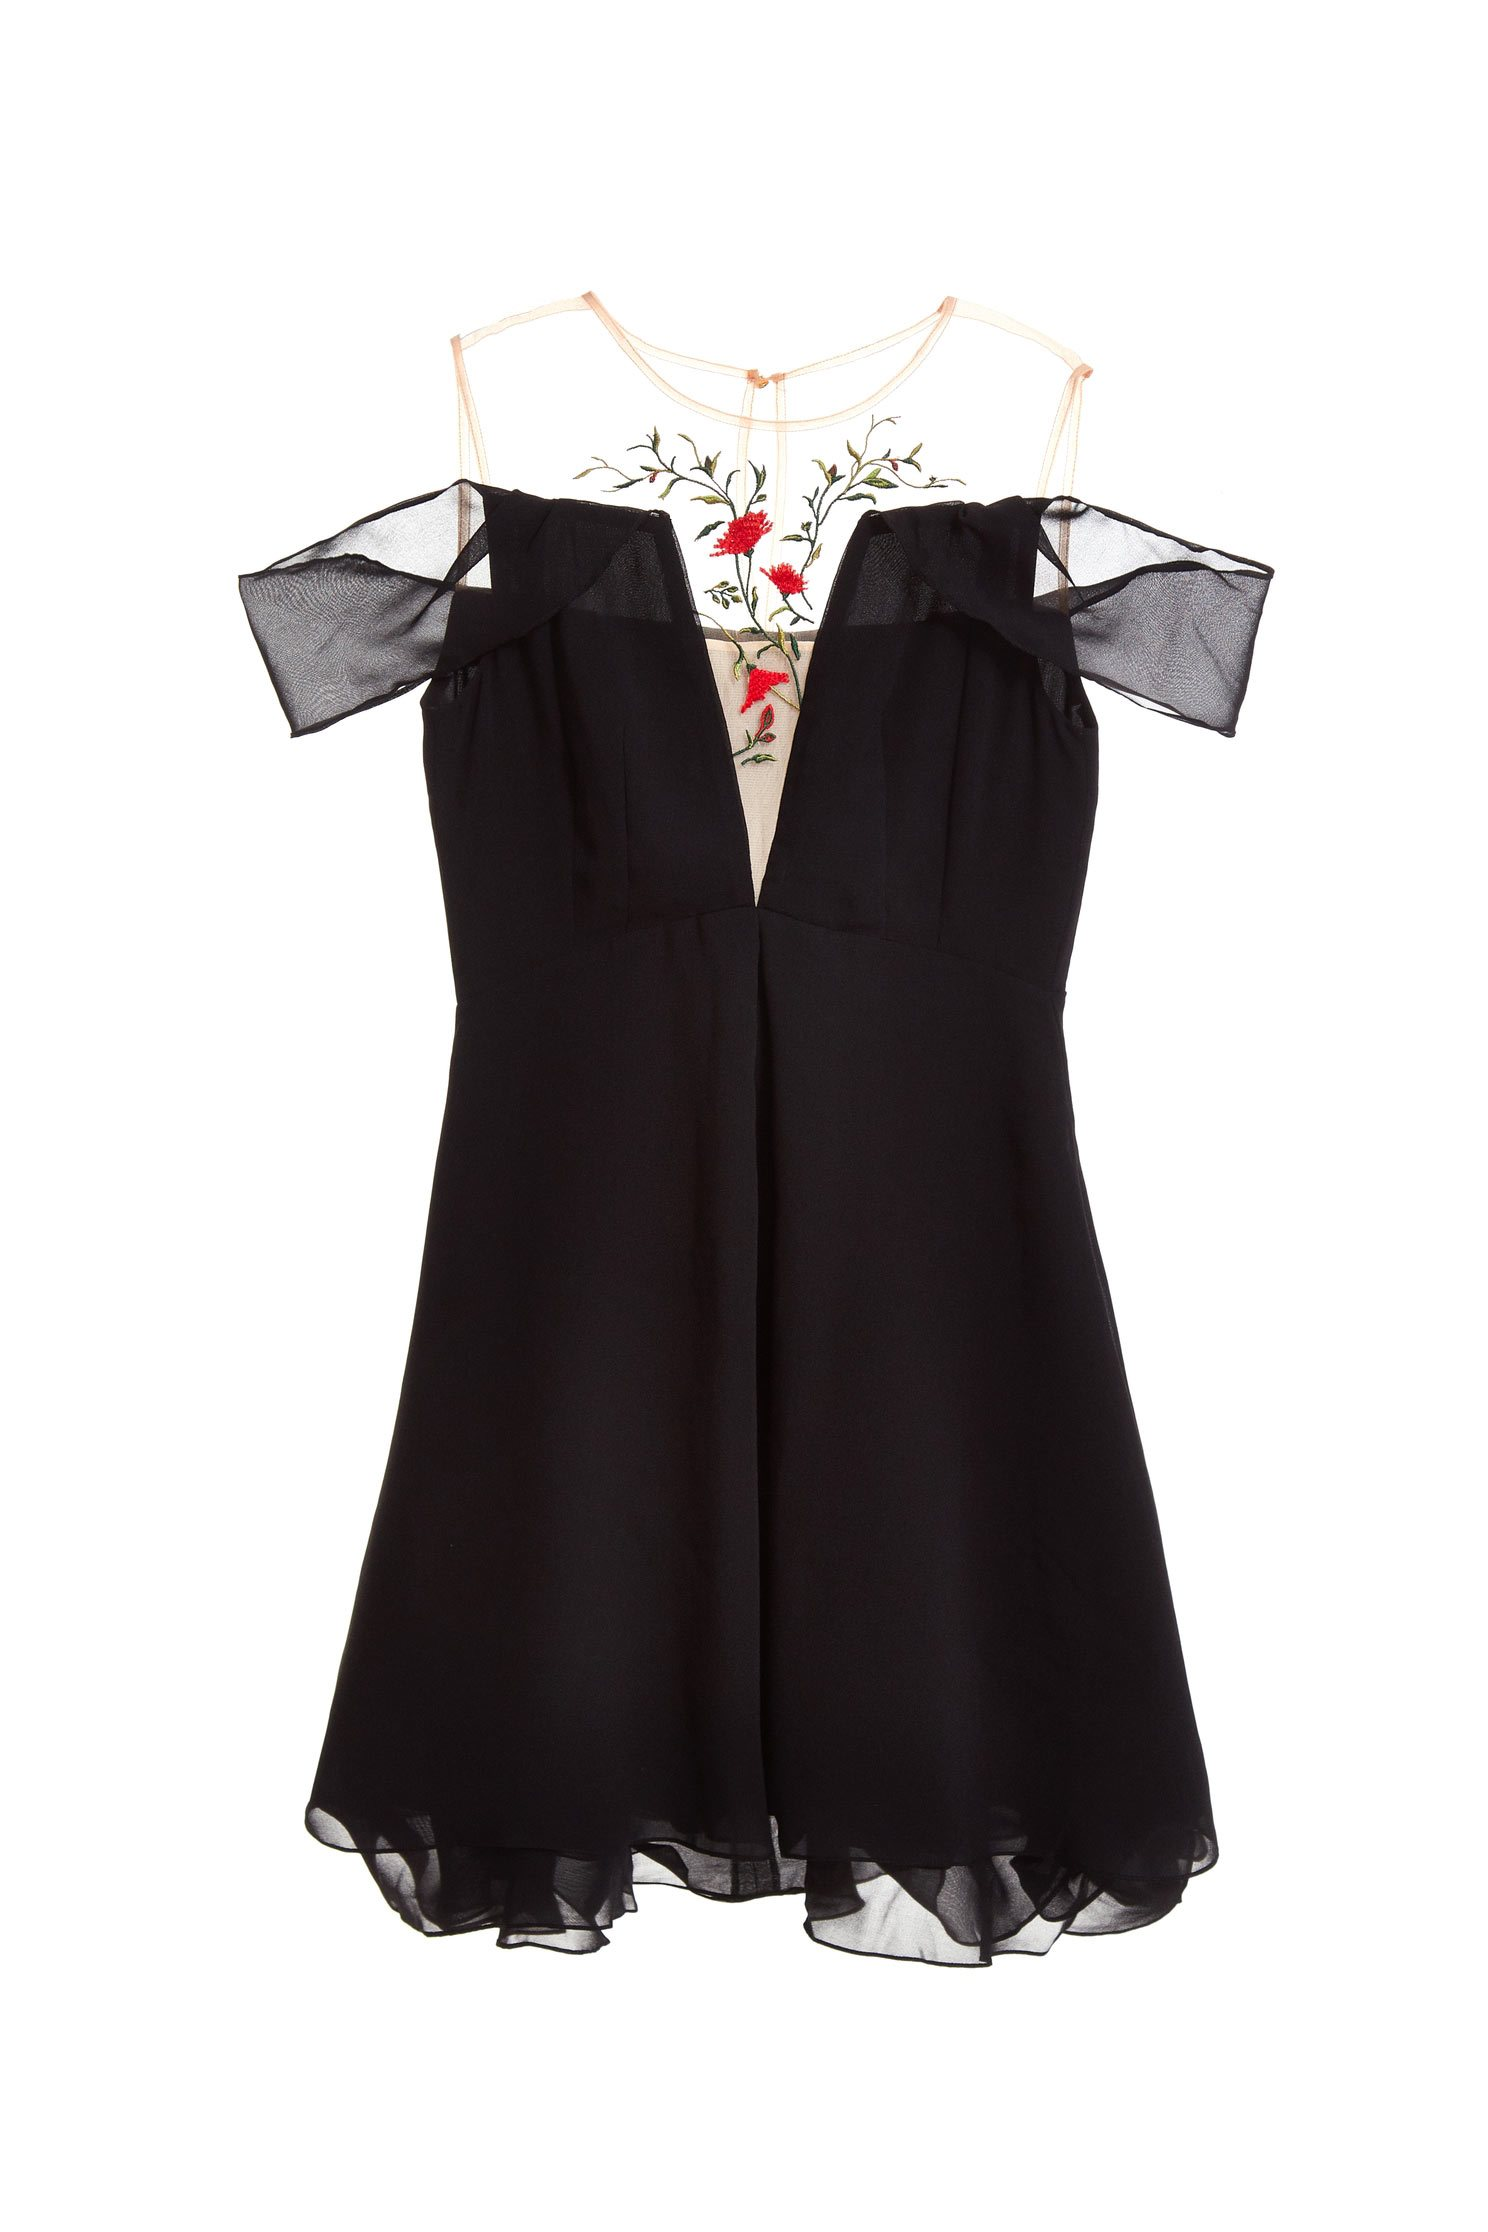 Translucent pattern gorgeous dress